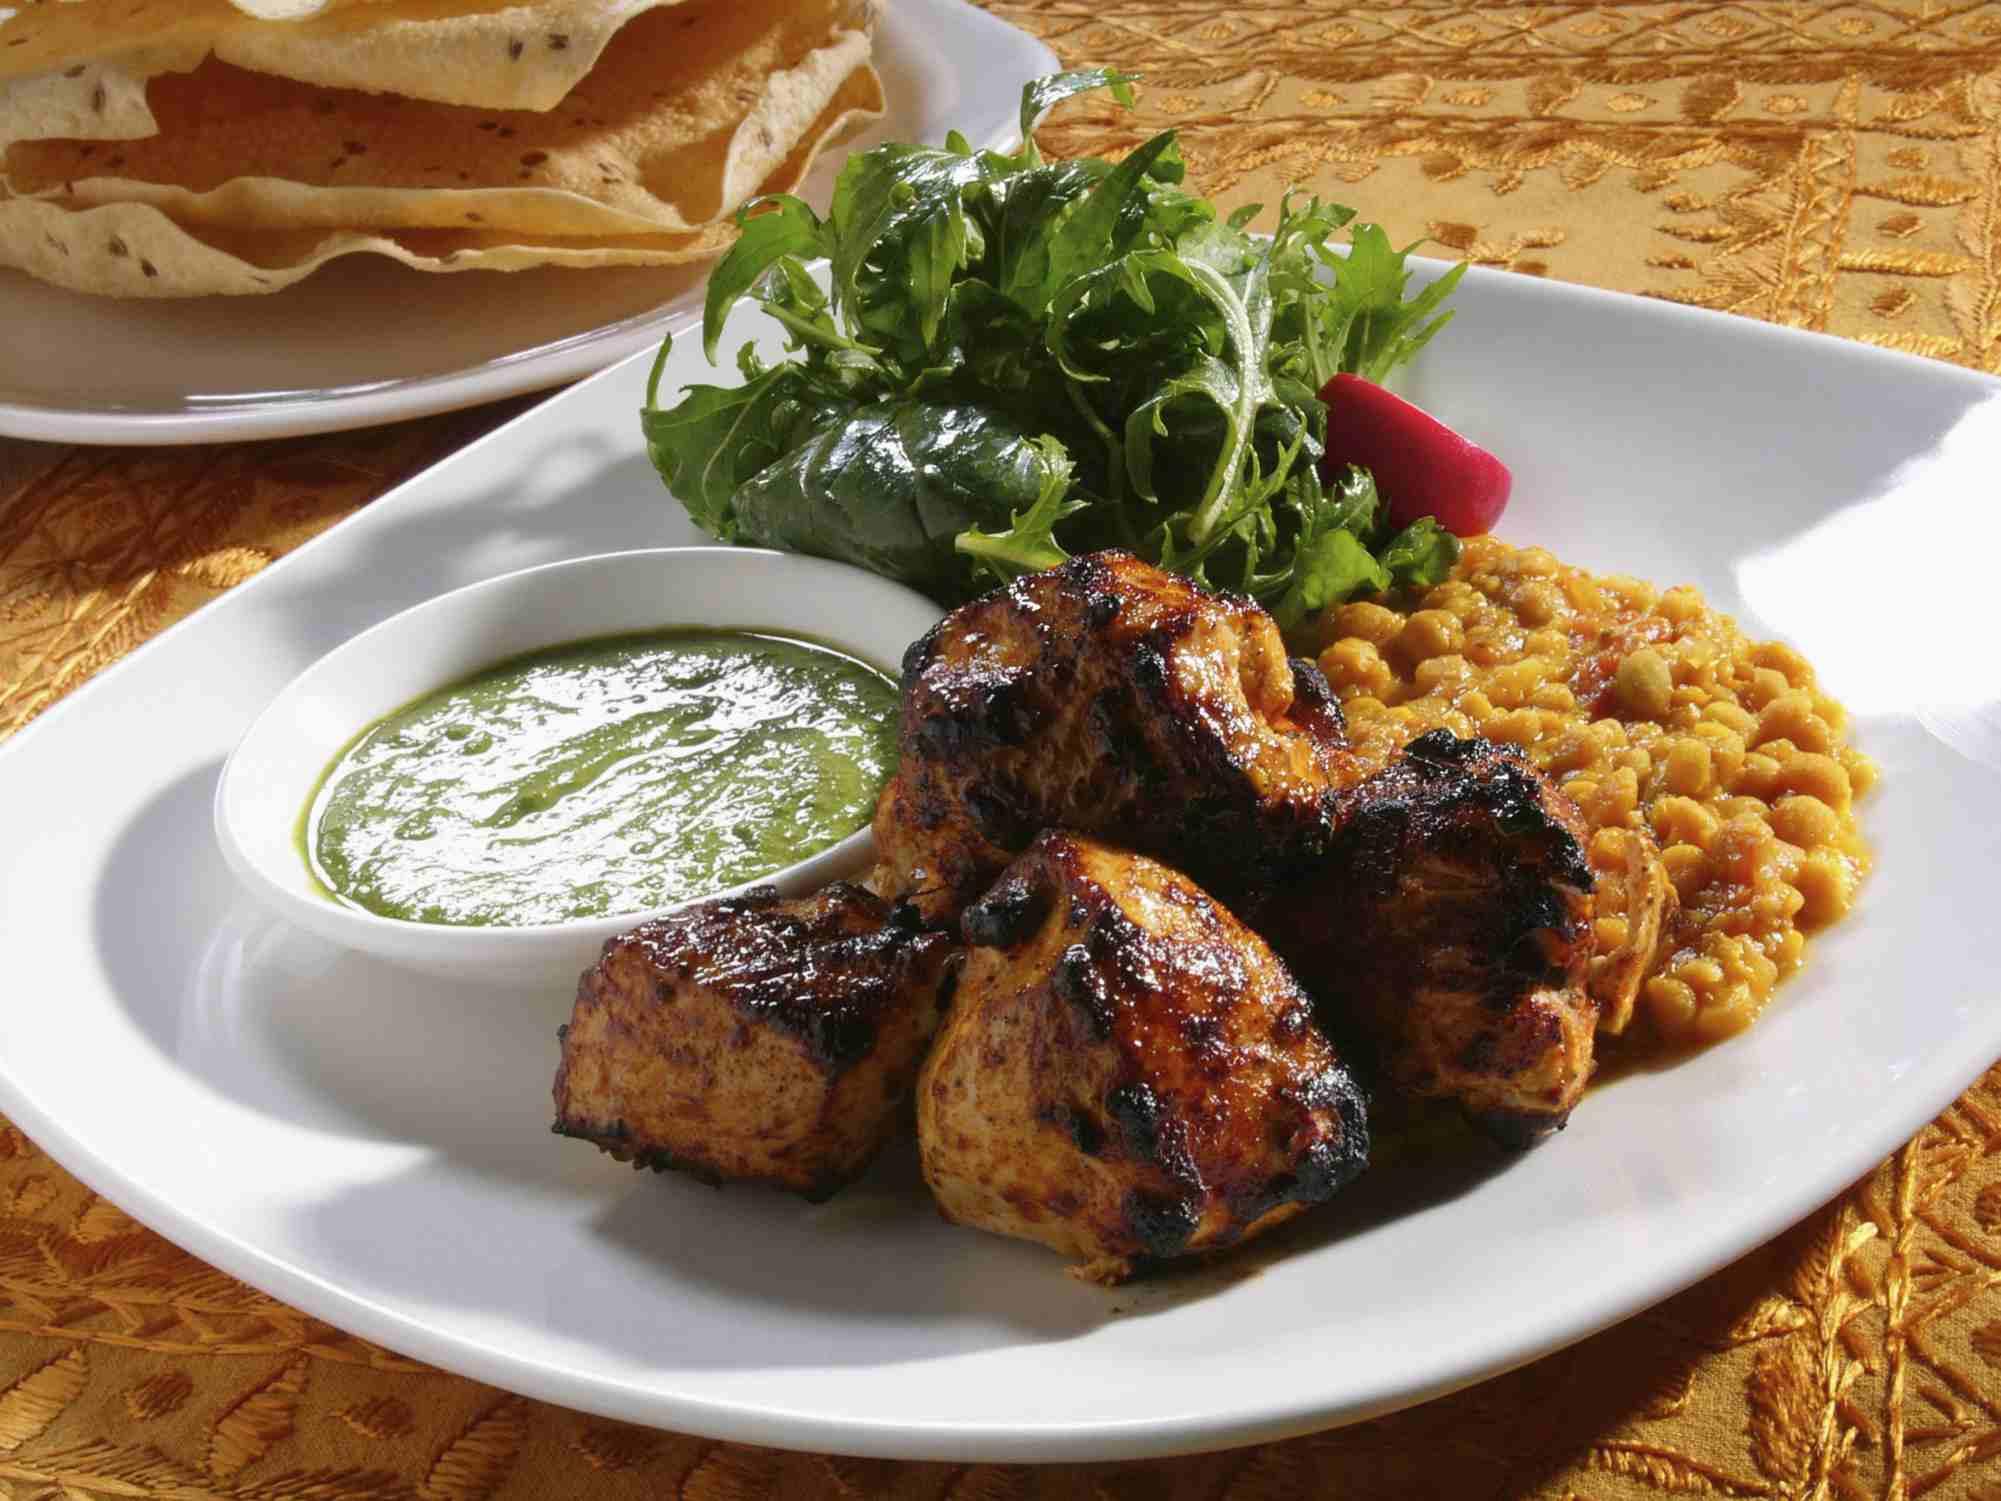 gluten-free Indian food